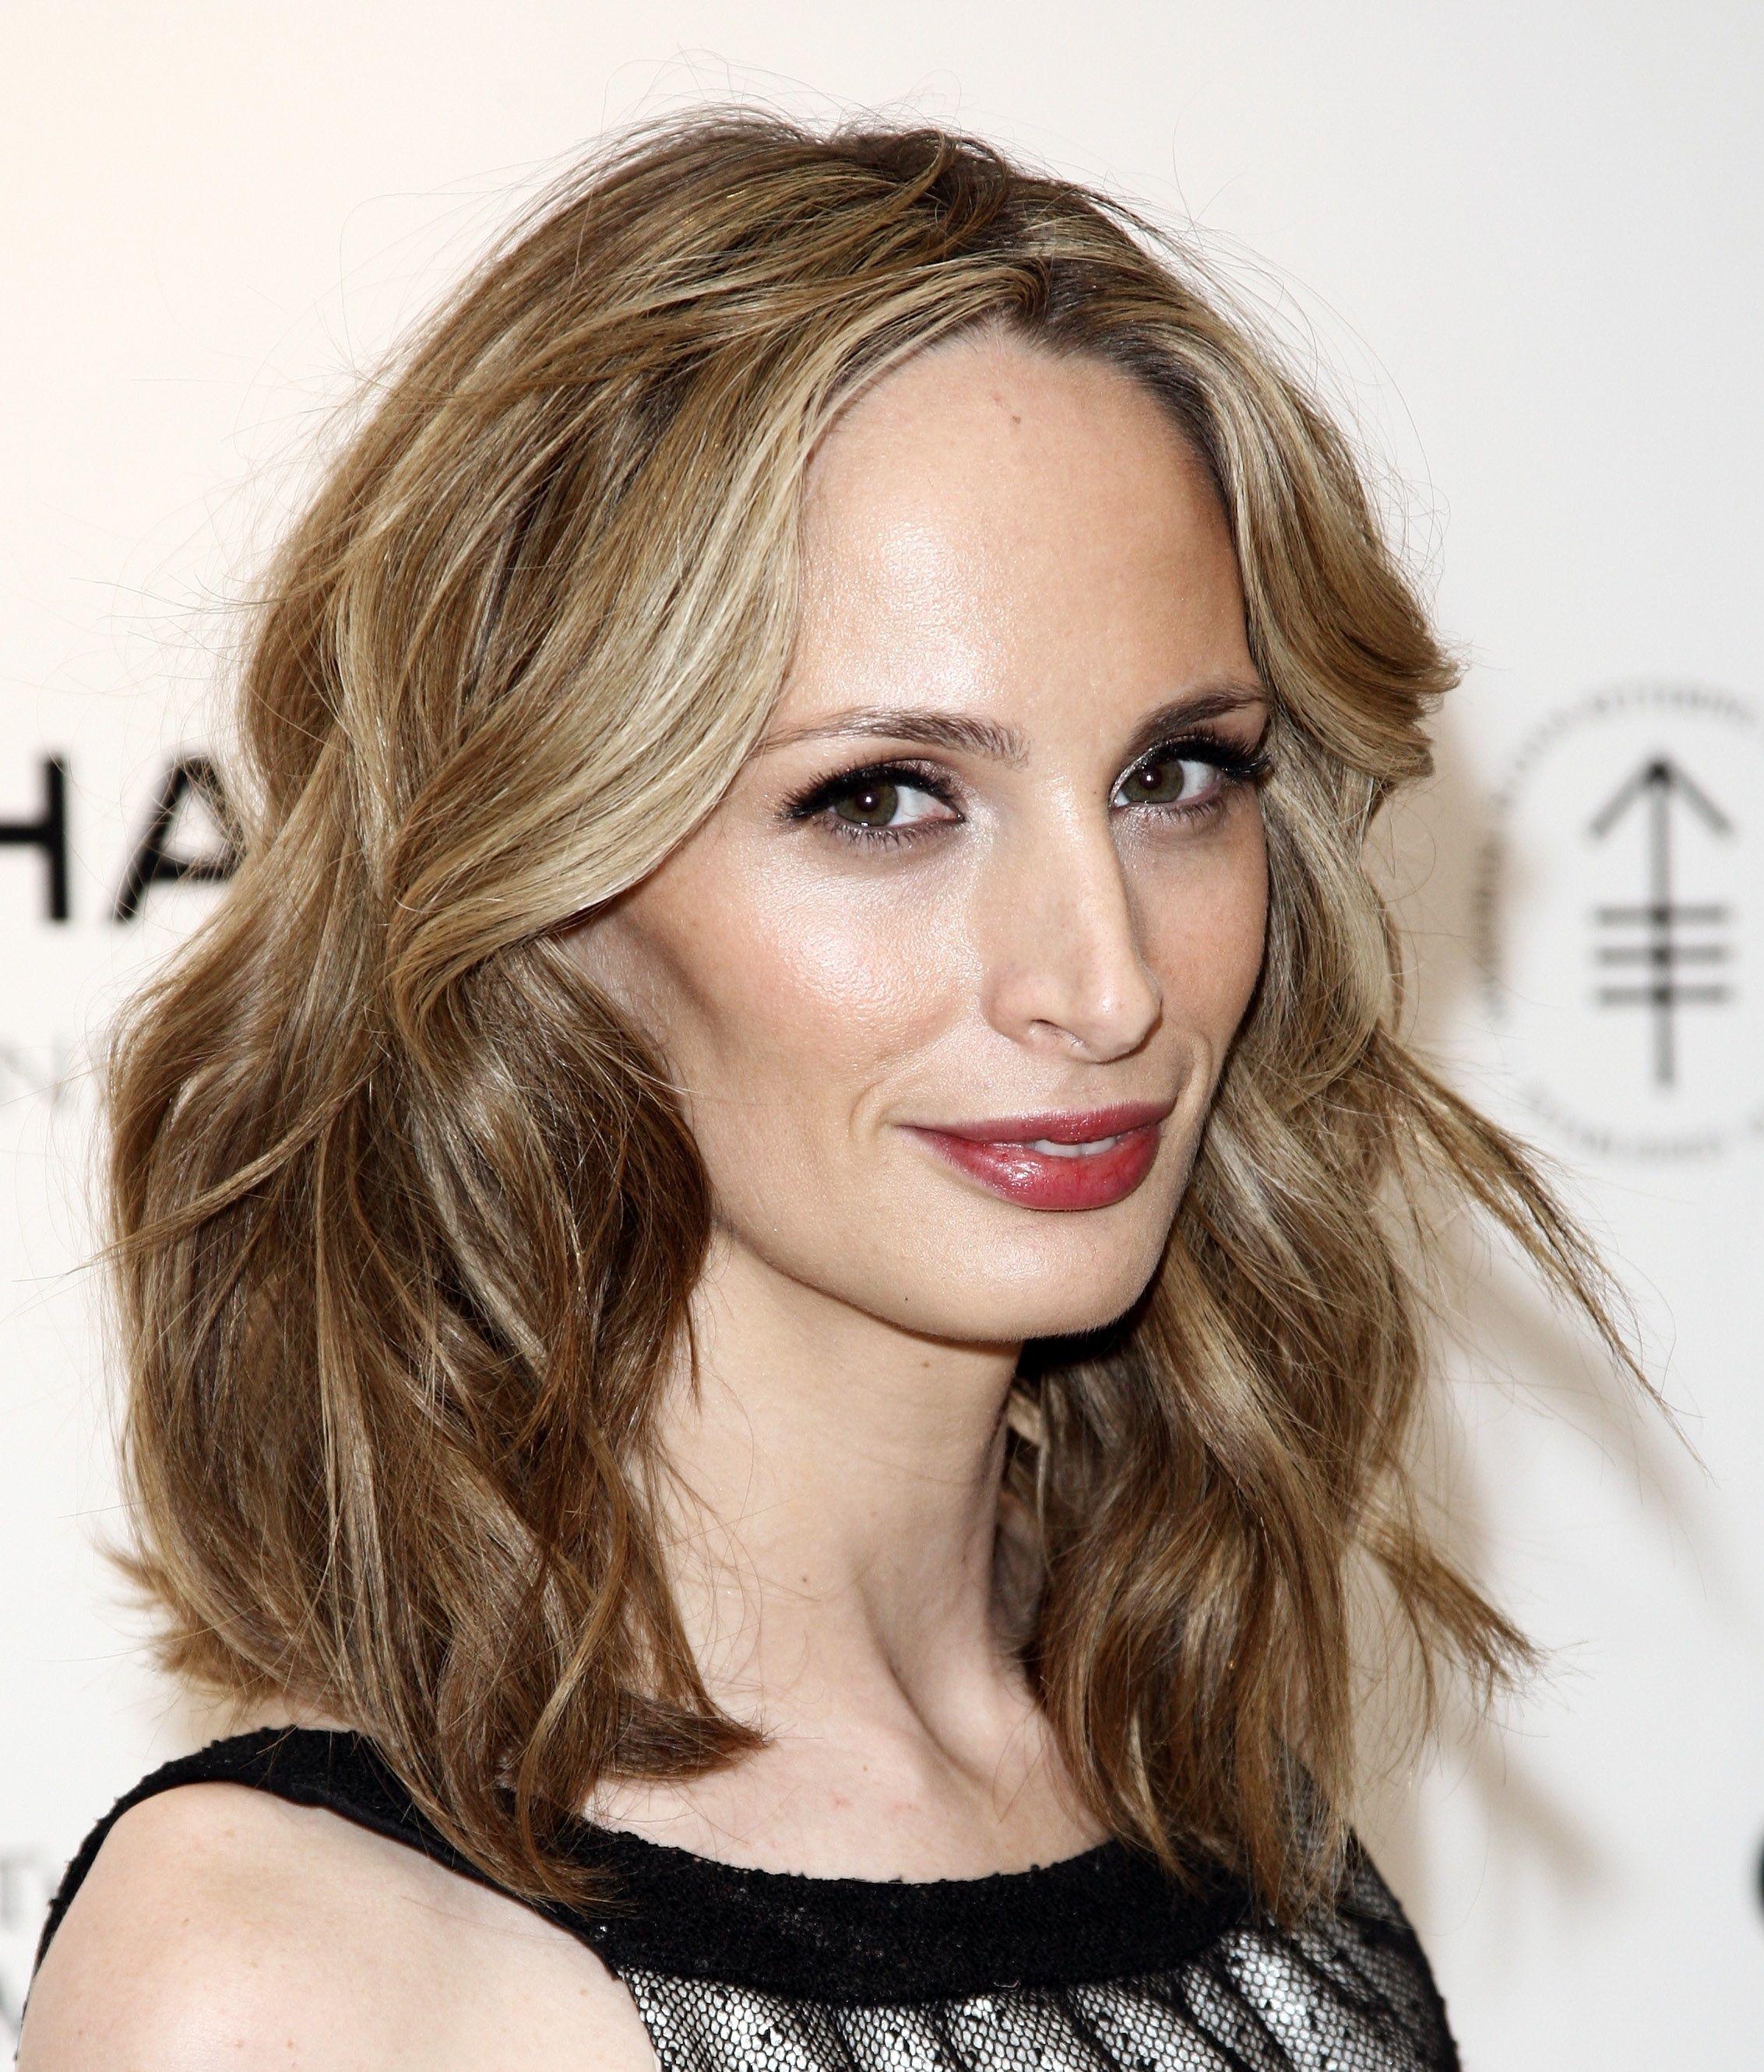 Medium Cut Hairstyles Adorable How To Nail The Mediumlength Hair Trend  Shoulder Length Hair